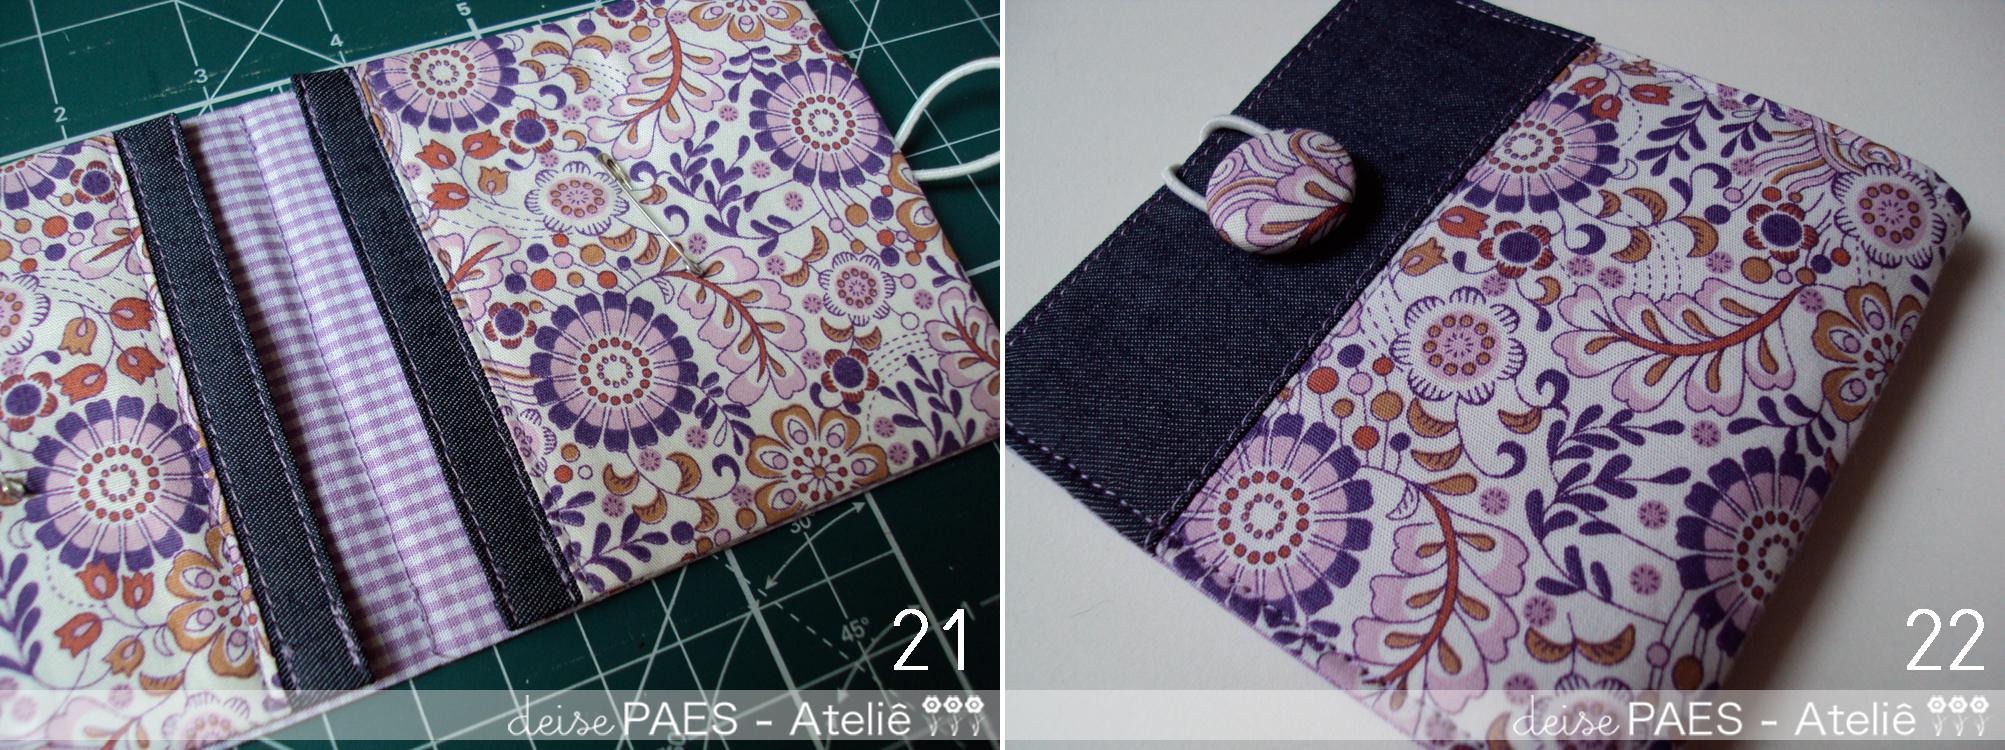 porta-absorventes - 11